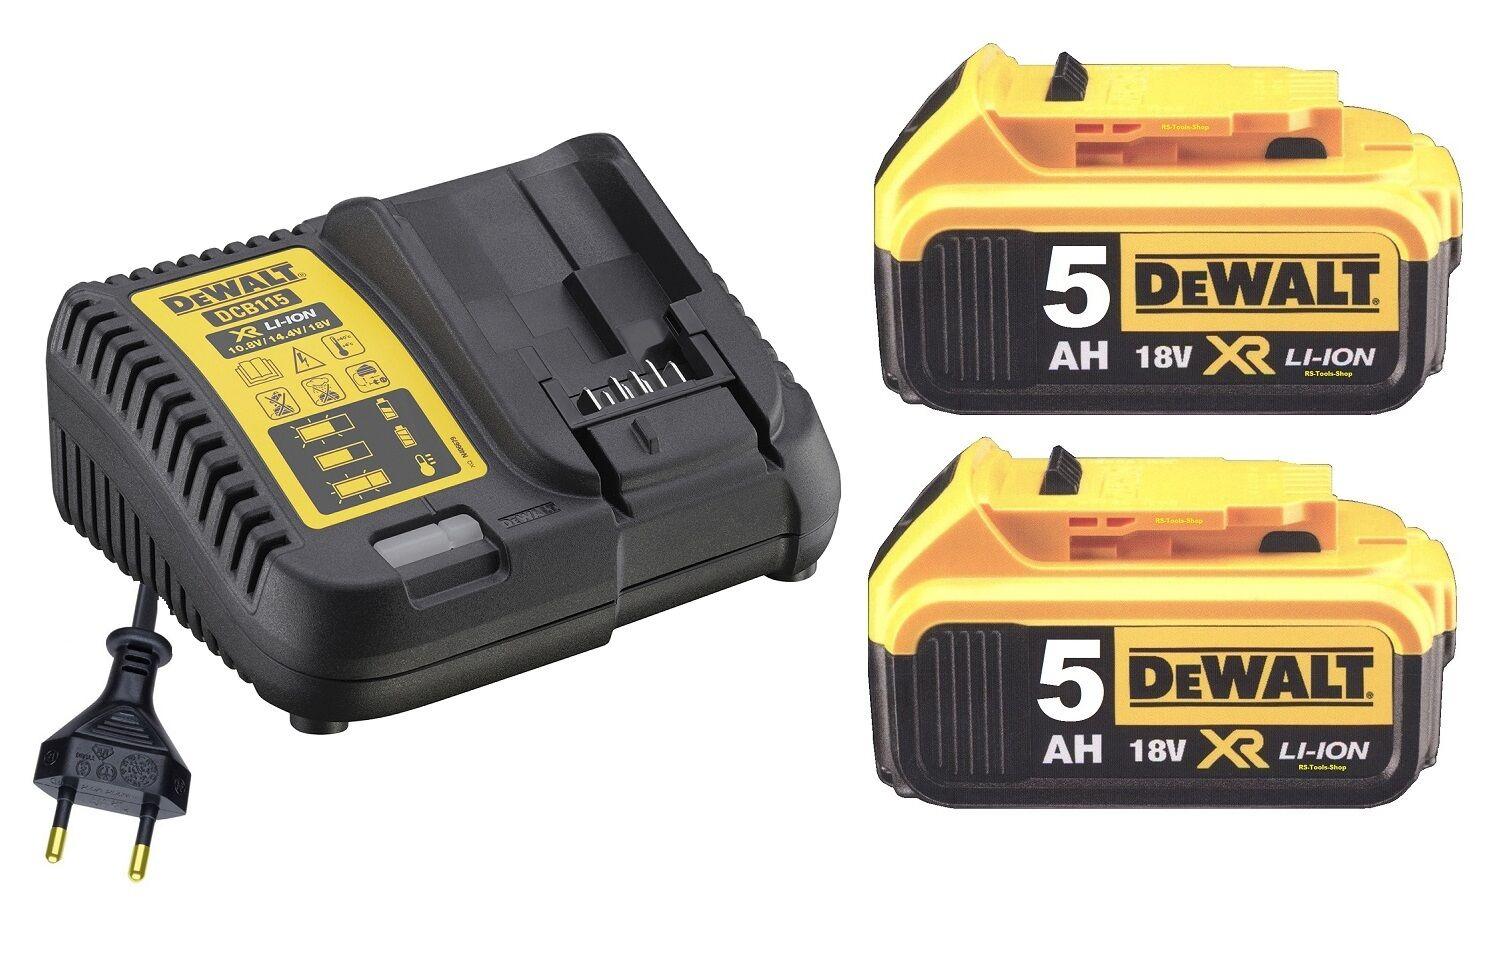 DeWALT DCB115P2 Akku + Starterkit  Ladegerät DCB115 + 2 x 5,0Ah Akku DCB184 neu